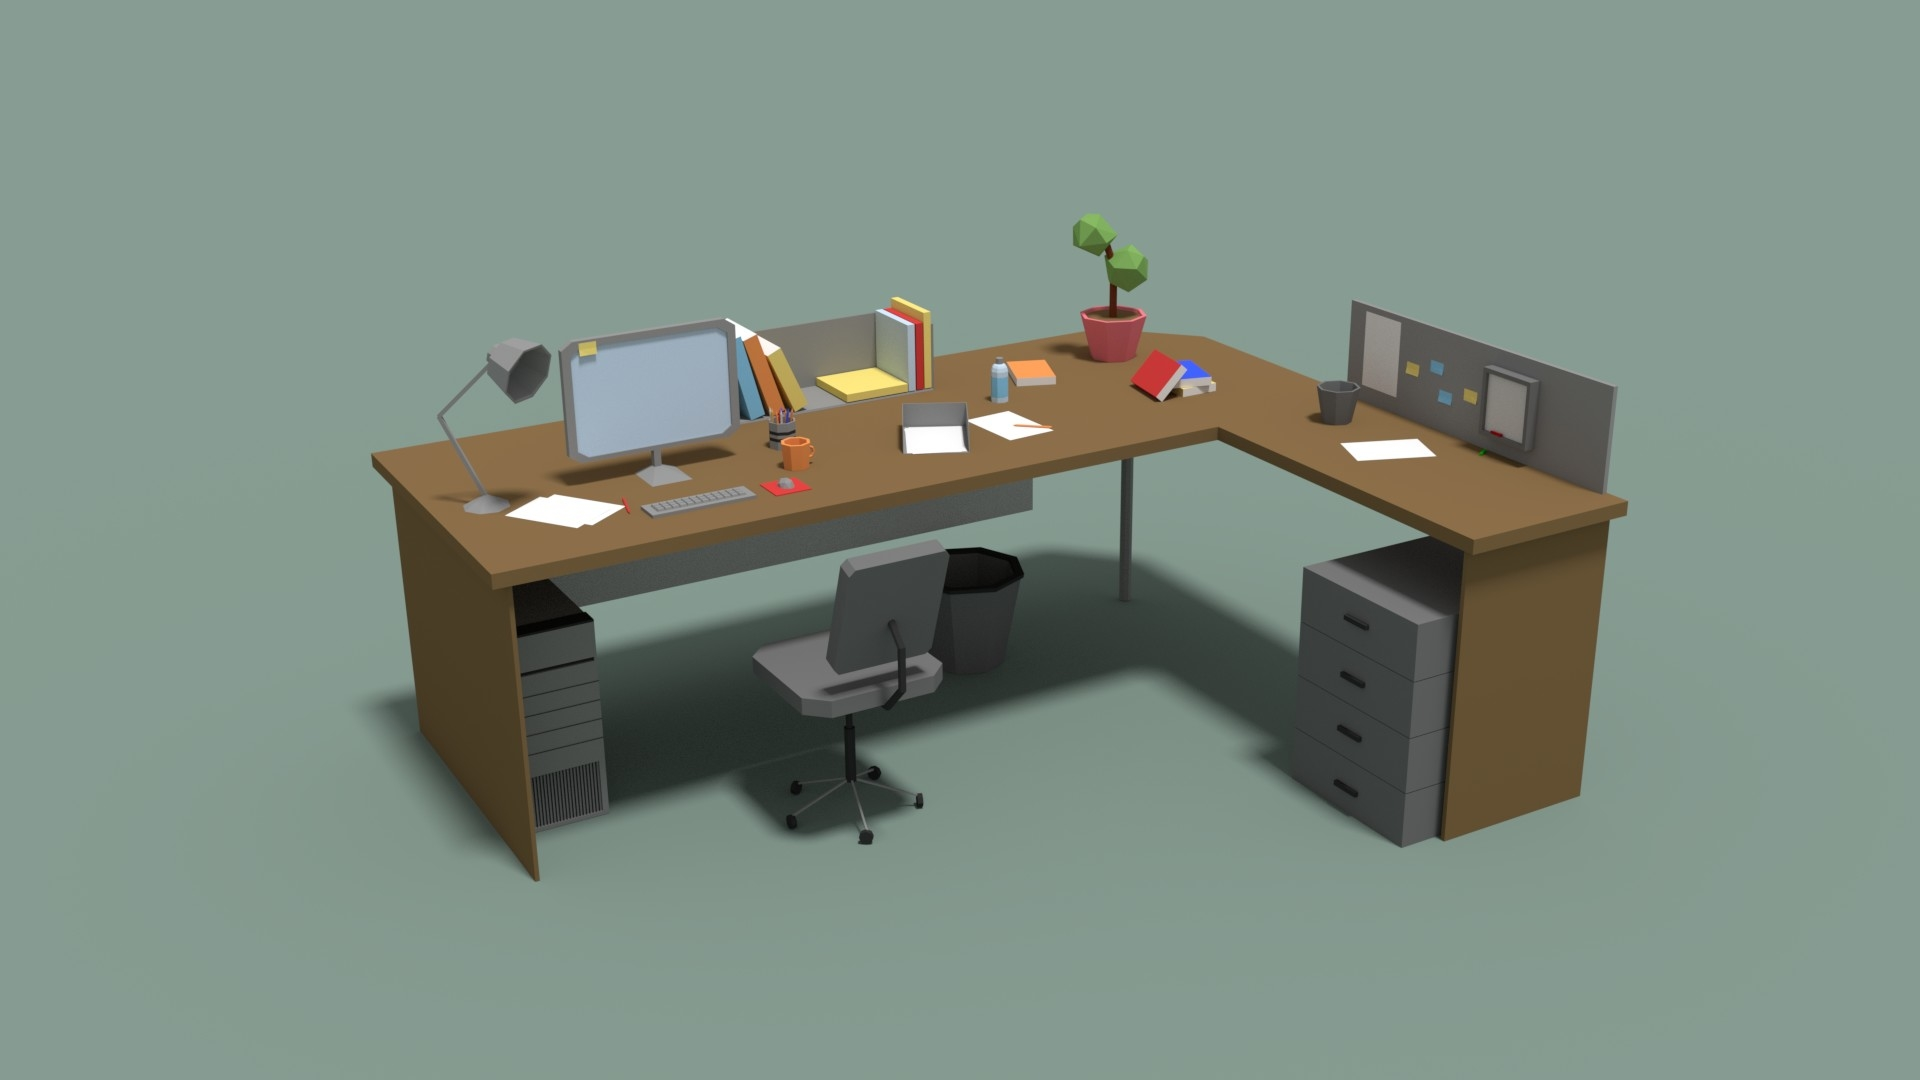 Stupendous Low Poly Cartoony Office Desk Evergreenethics Interior Chair Design Evergreenethicsorg